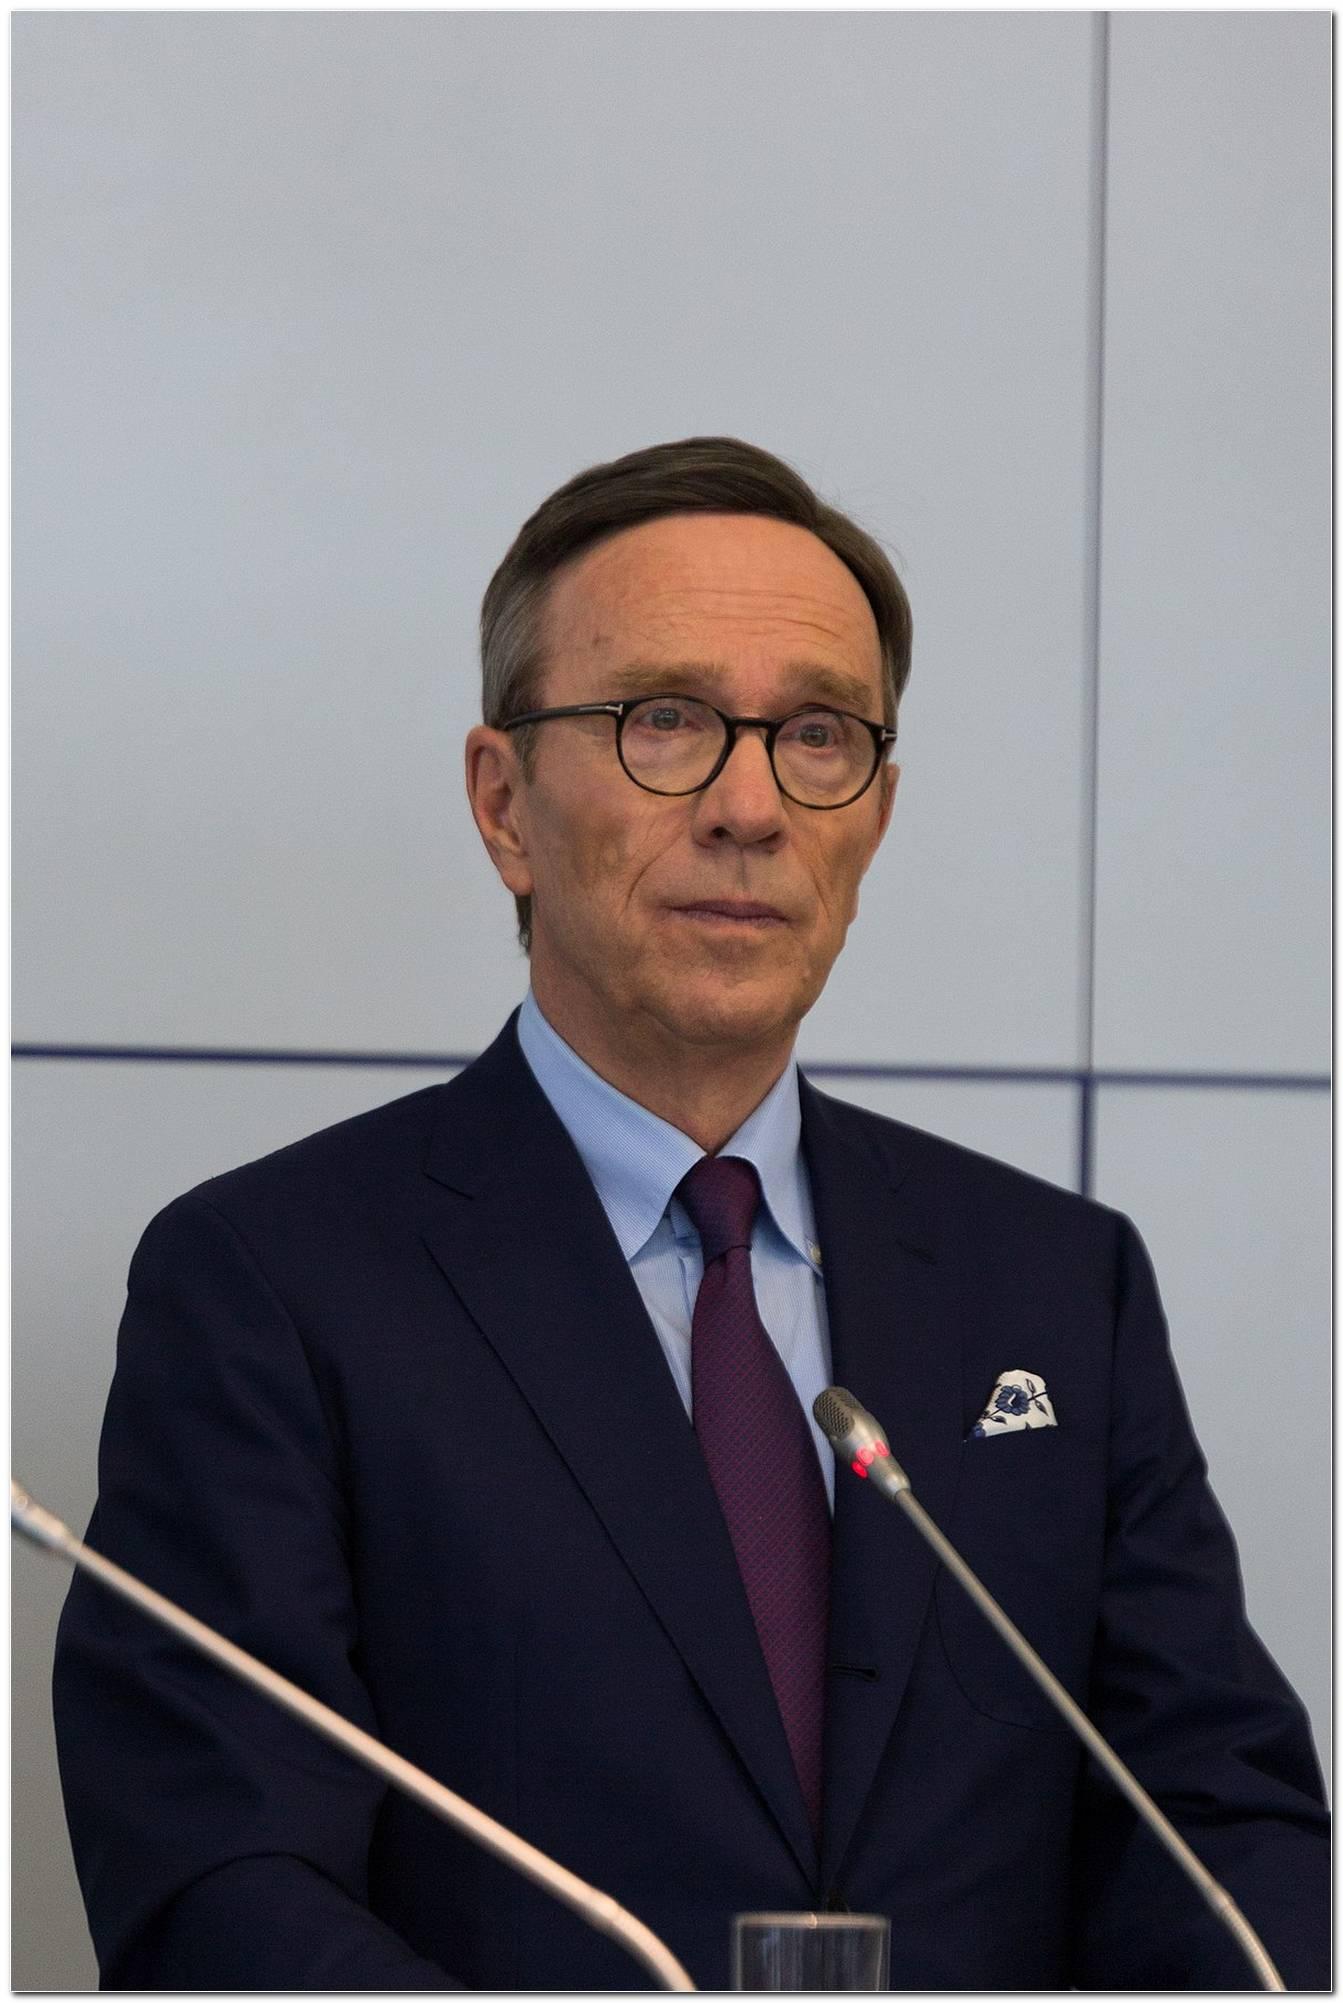 Matthias Wissmann Frisur